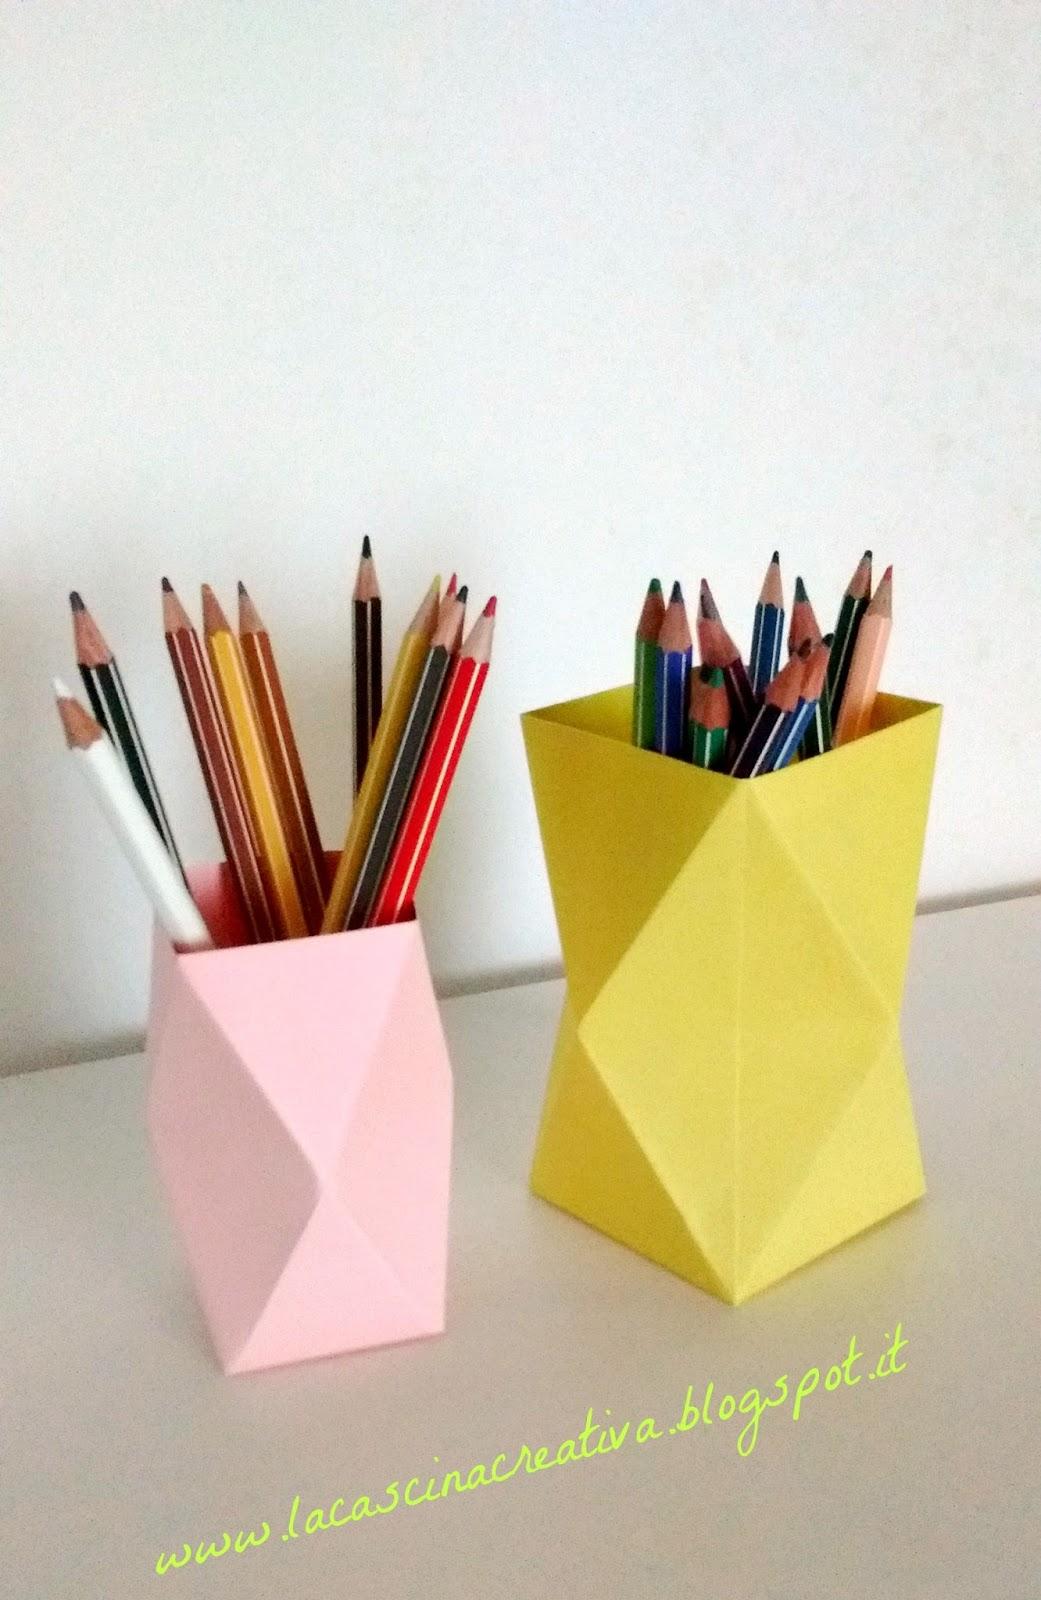 La cascina creativa portapenne o lanterne - Portapenne ikea ...